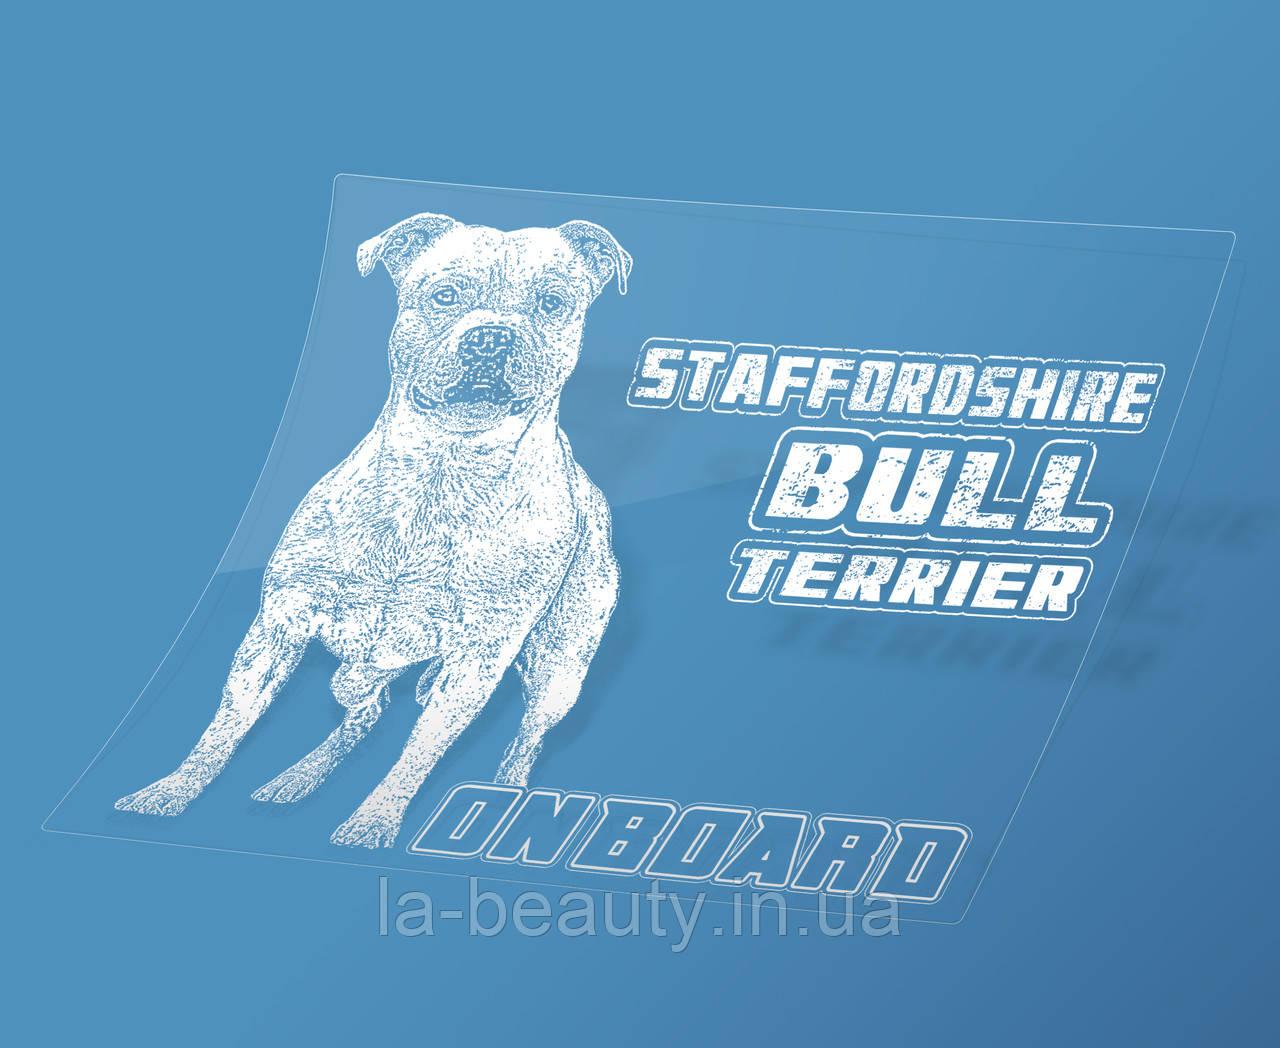 Наклейка на машину/авто Стаффордширский бультерьер на борту (Staffordshire Bull Terrier on Board)